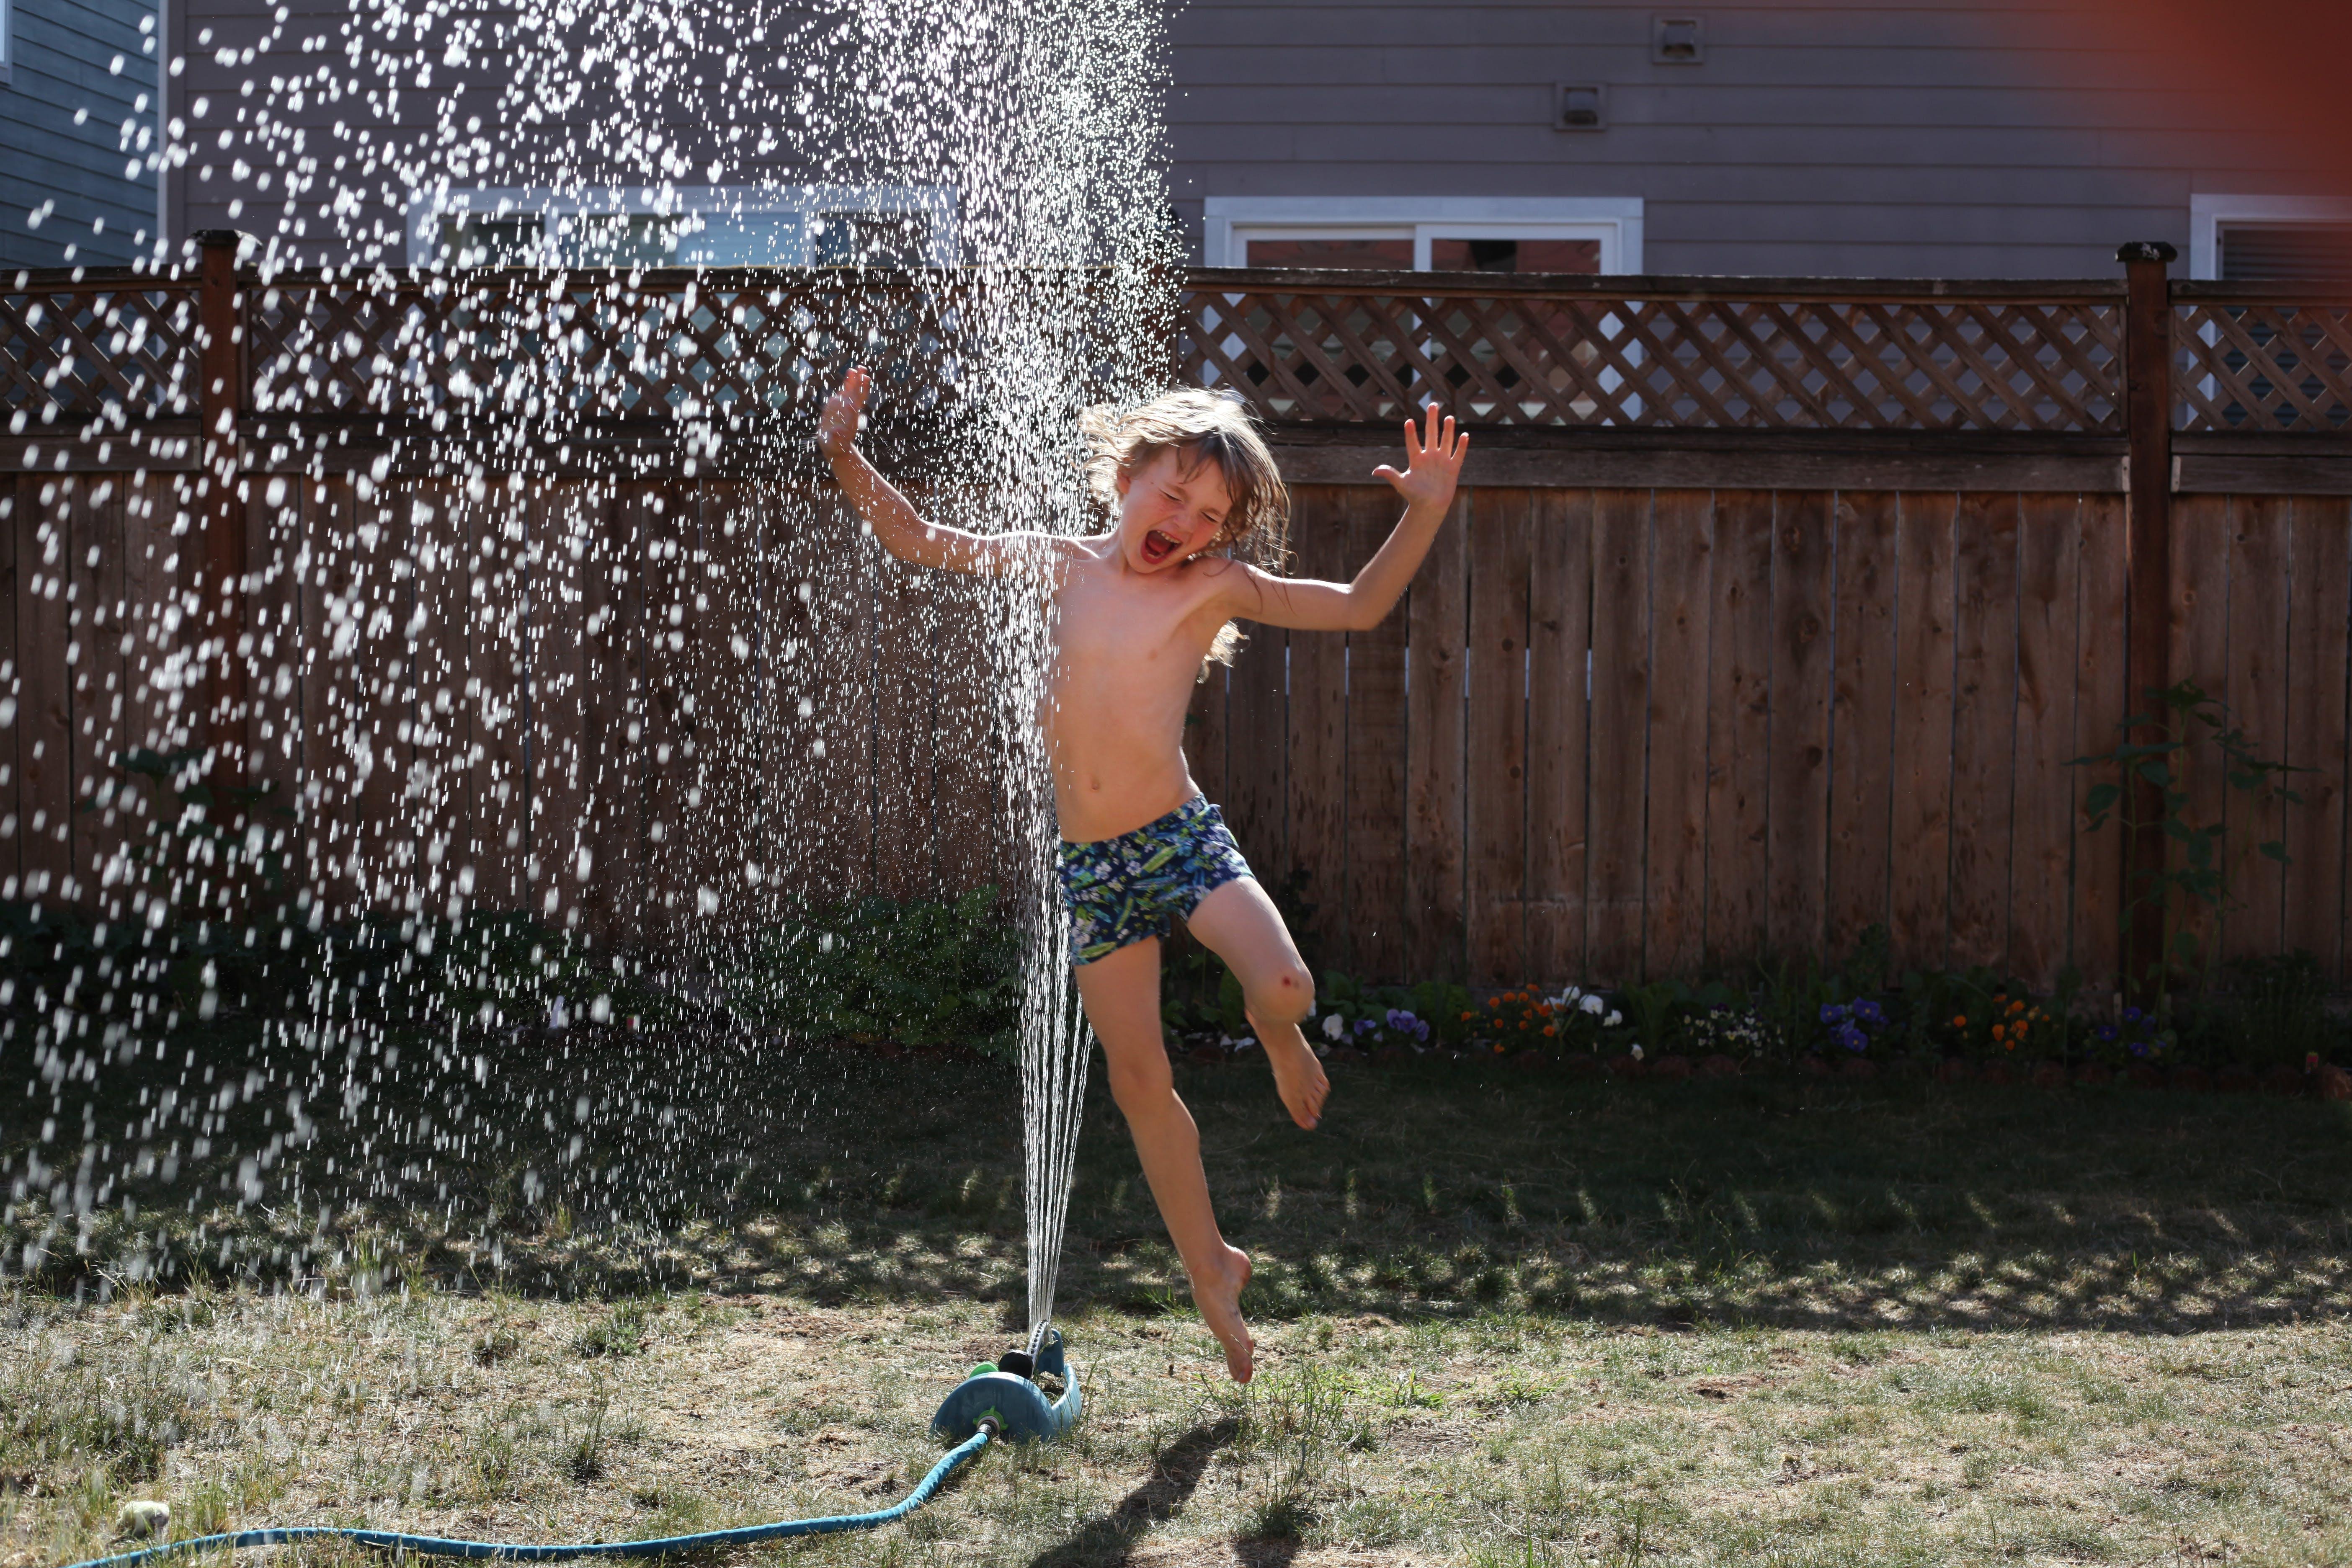 Boy Jumping Near Sprinkler